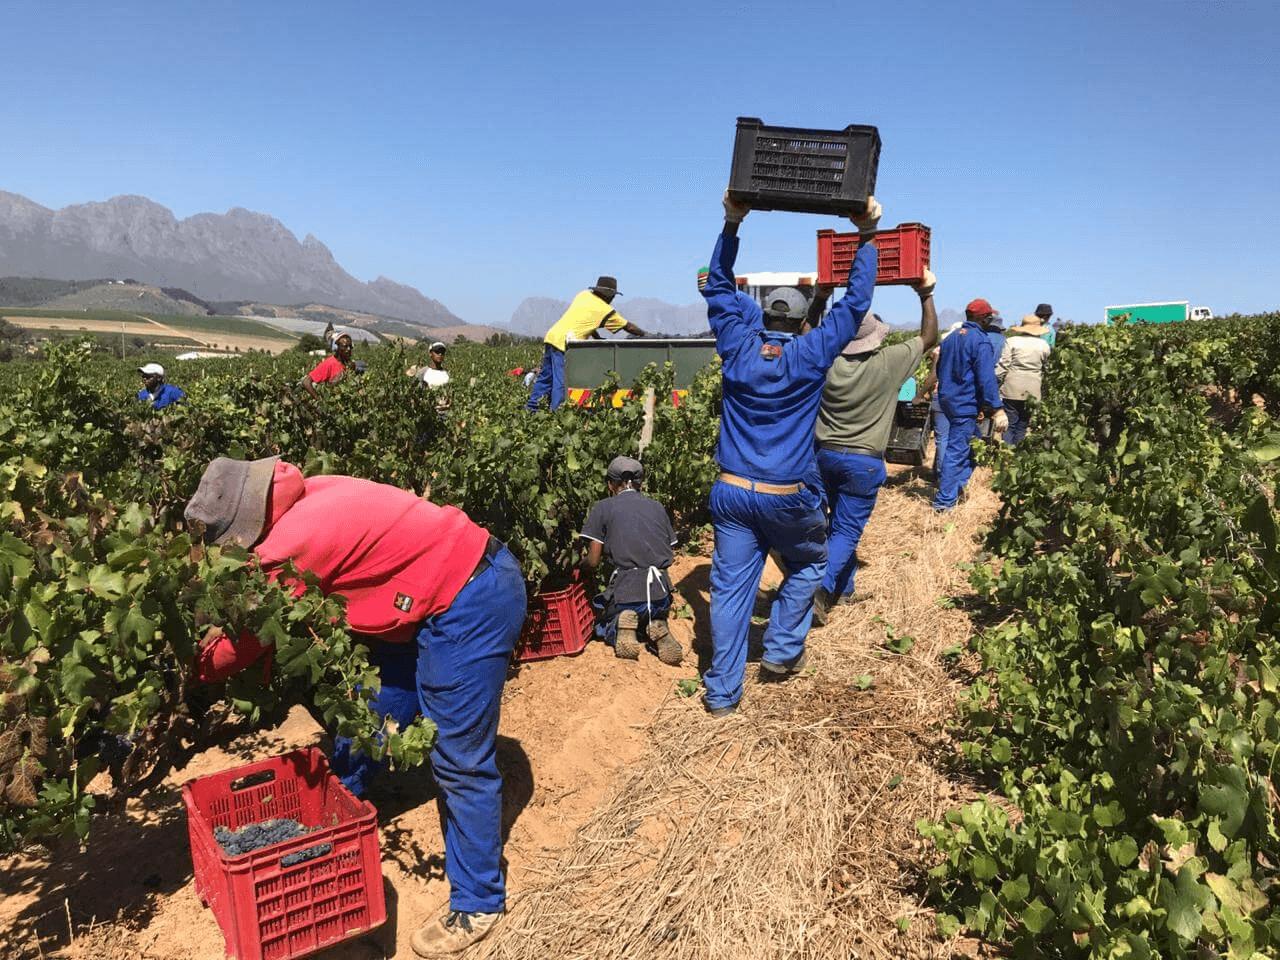 simonsig-harvest-2019-in-progressFMe24eMJtbM6r